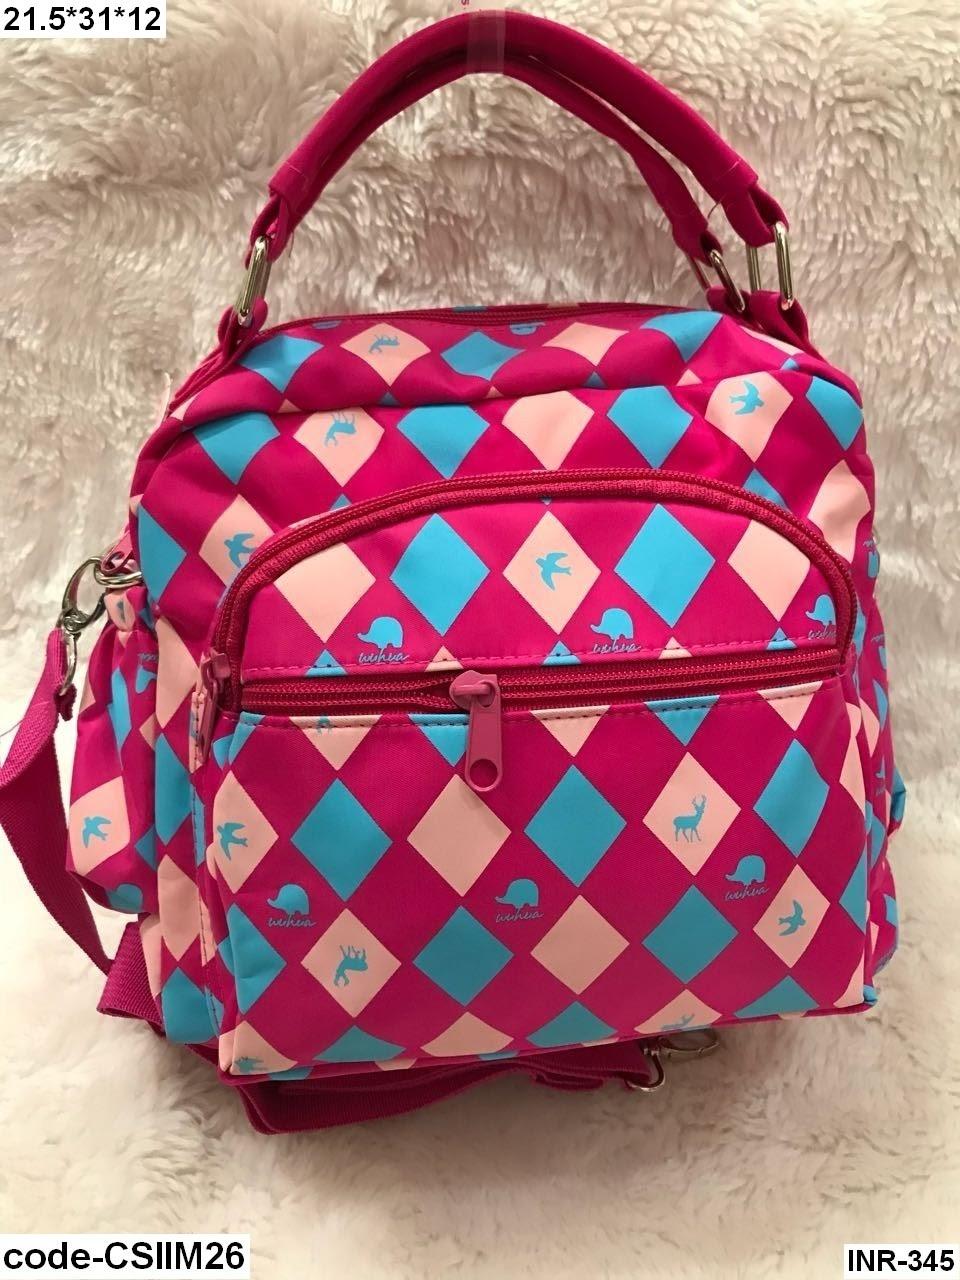 Imported Charming Handbag